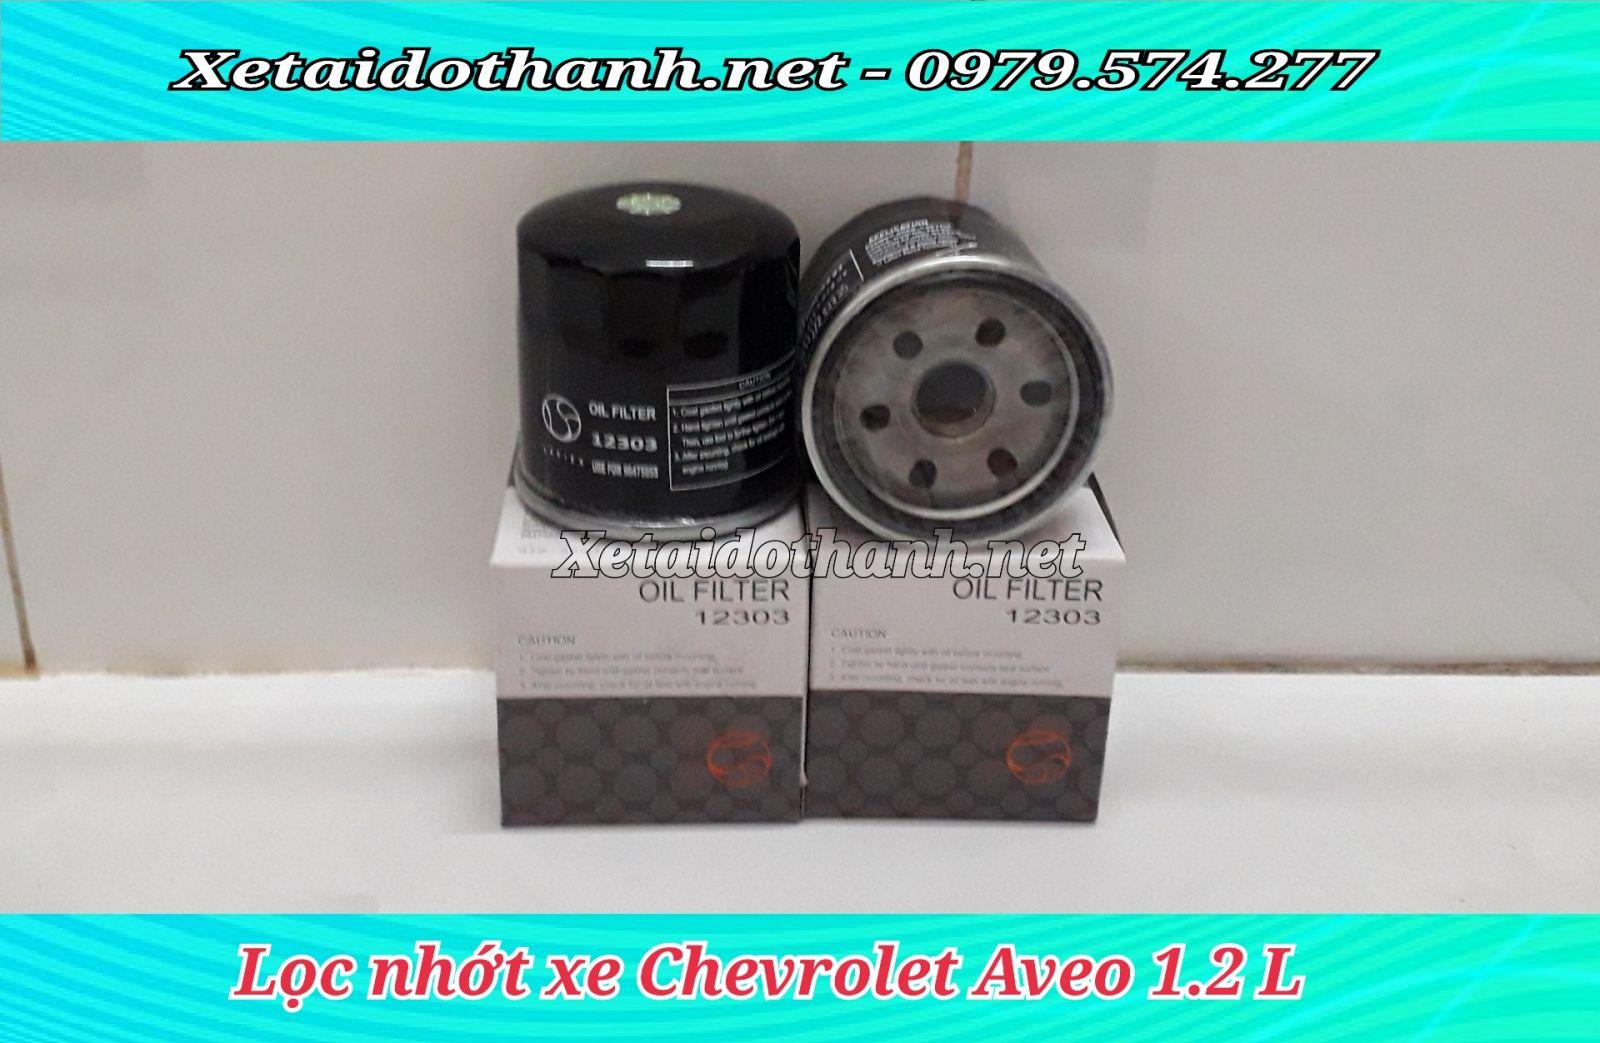 Lọc nhớt Xe Chevrolet Aveo